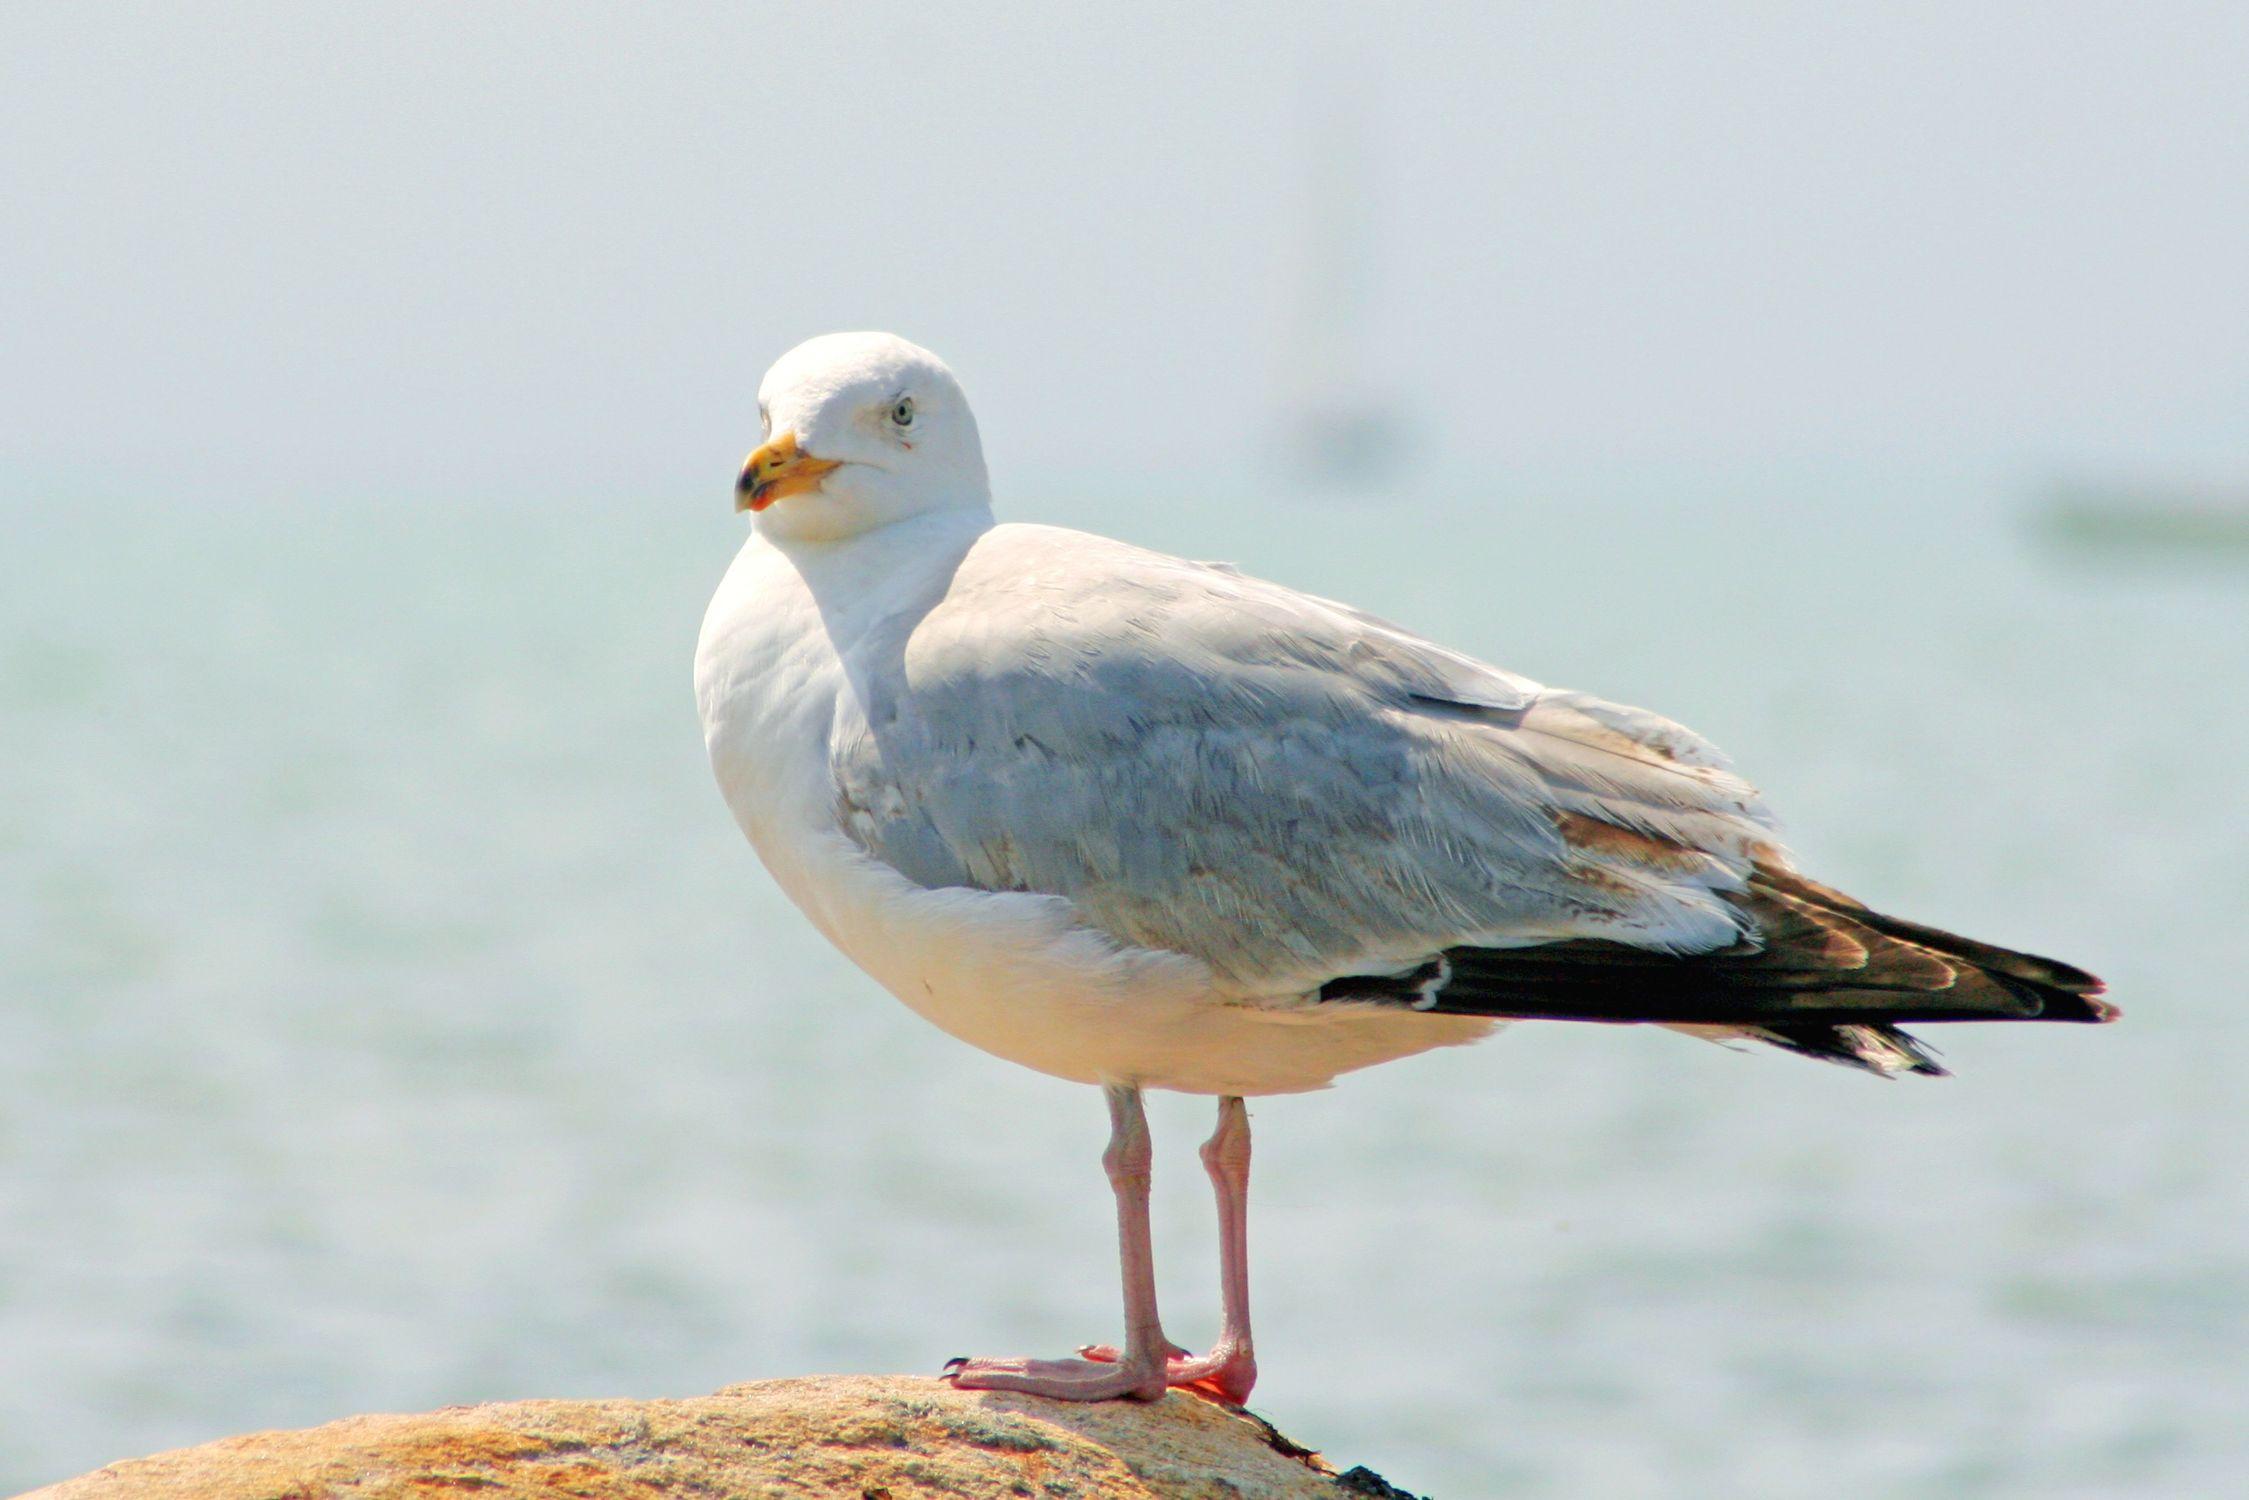 Bild mit Tiere, Natur, Vögel, Vögel, Wasservögel, Möwen, Federn, Tier, Möwe, Möwe am Strand, Möwen am Strand, Laridae, Möwenvögel, Möwenvögel, Watvögel